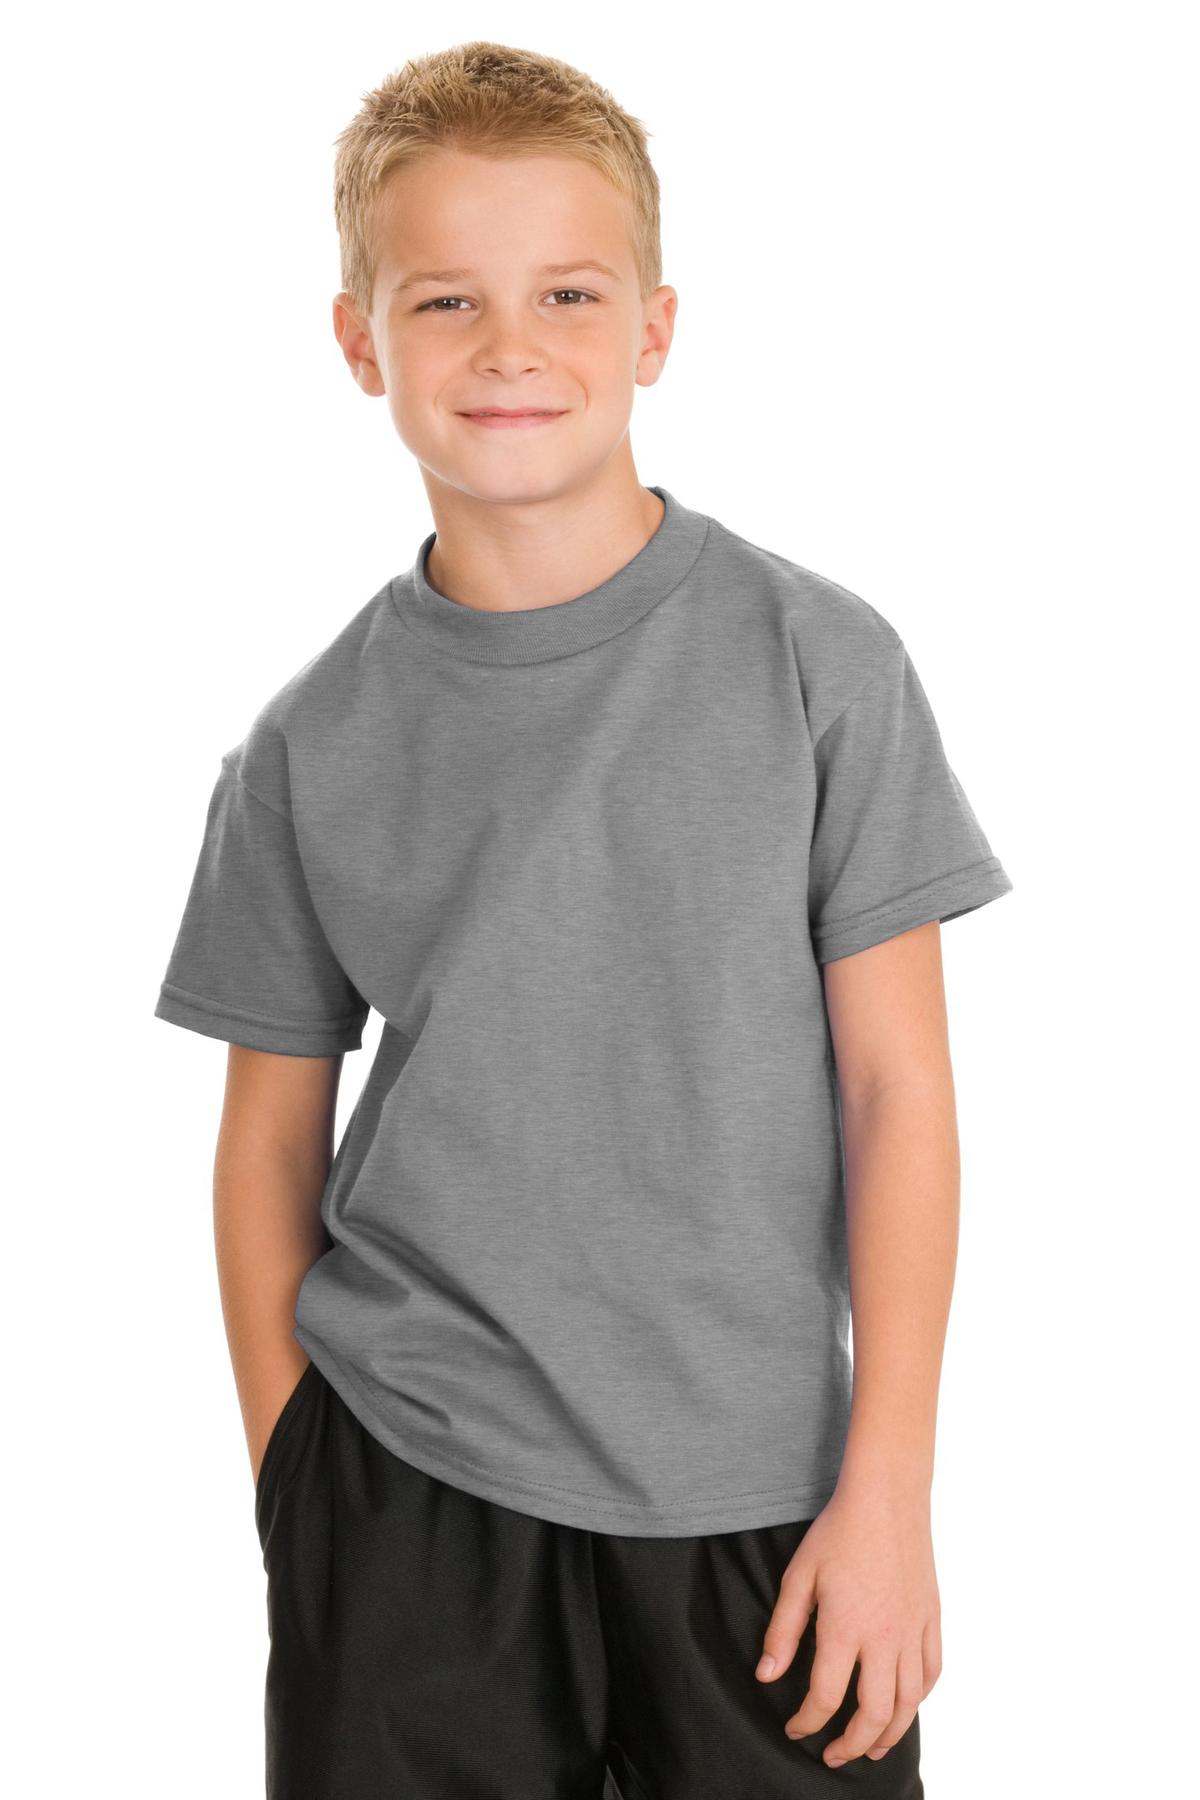 T-Shirts-100-Cotton-29